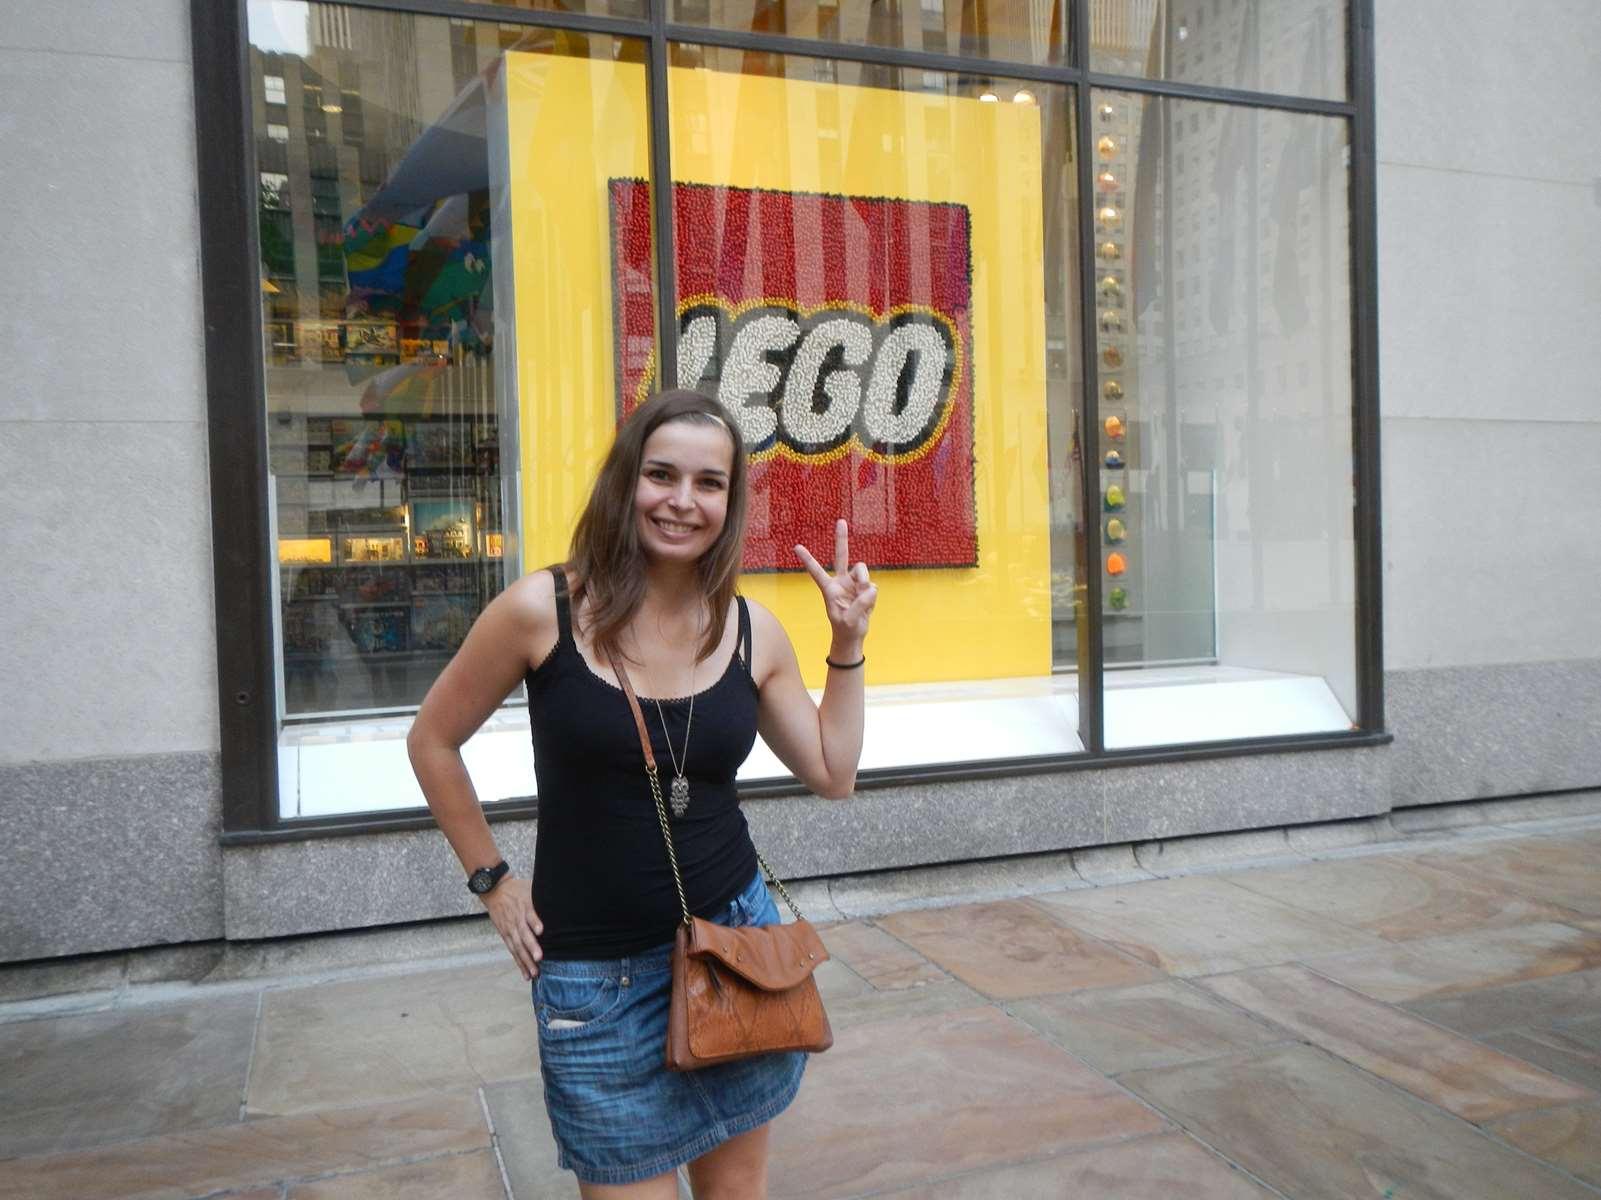 New York - Lego Store